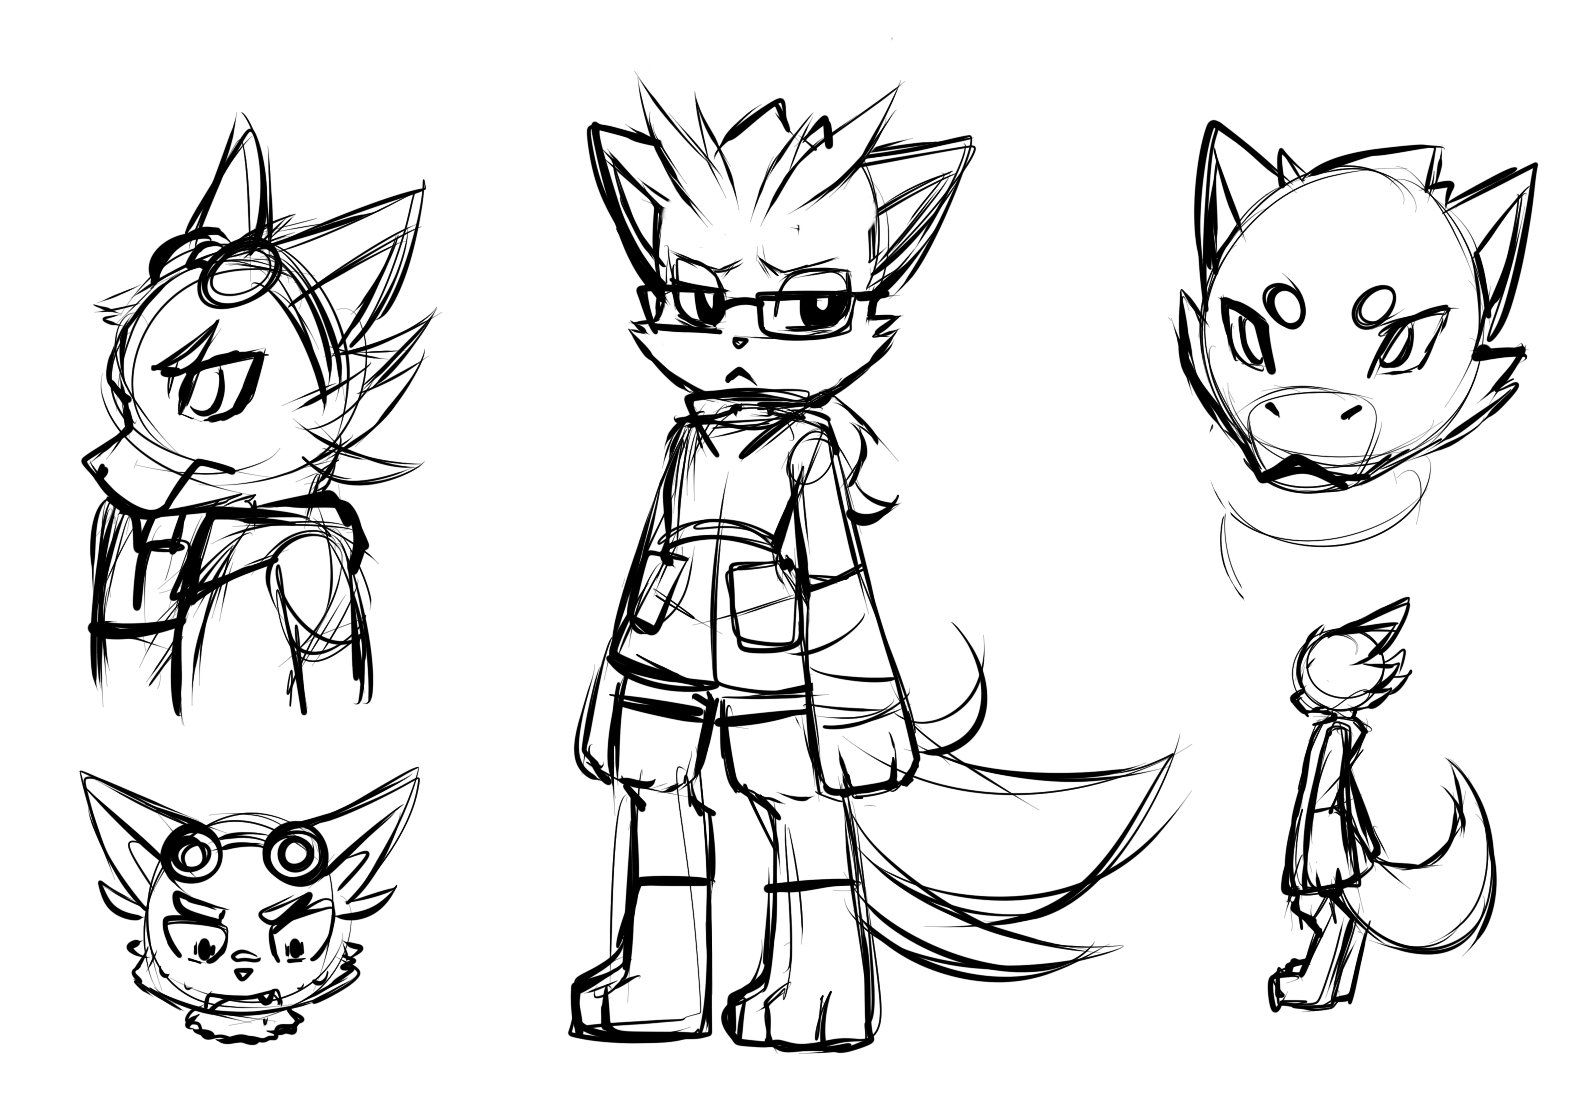 noddle sketches